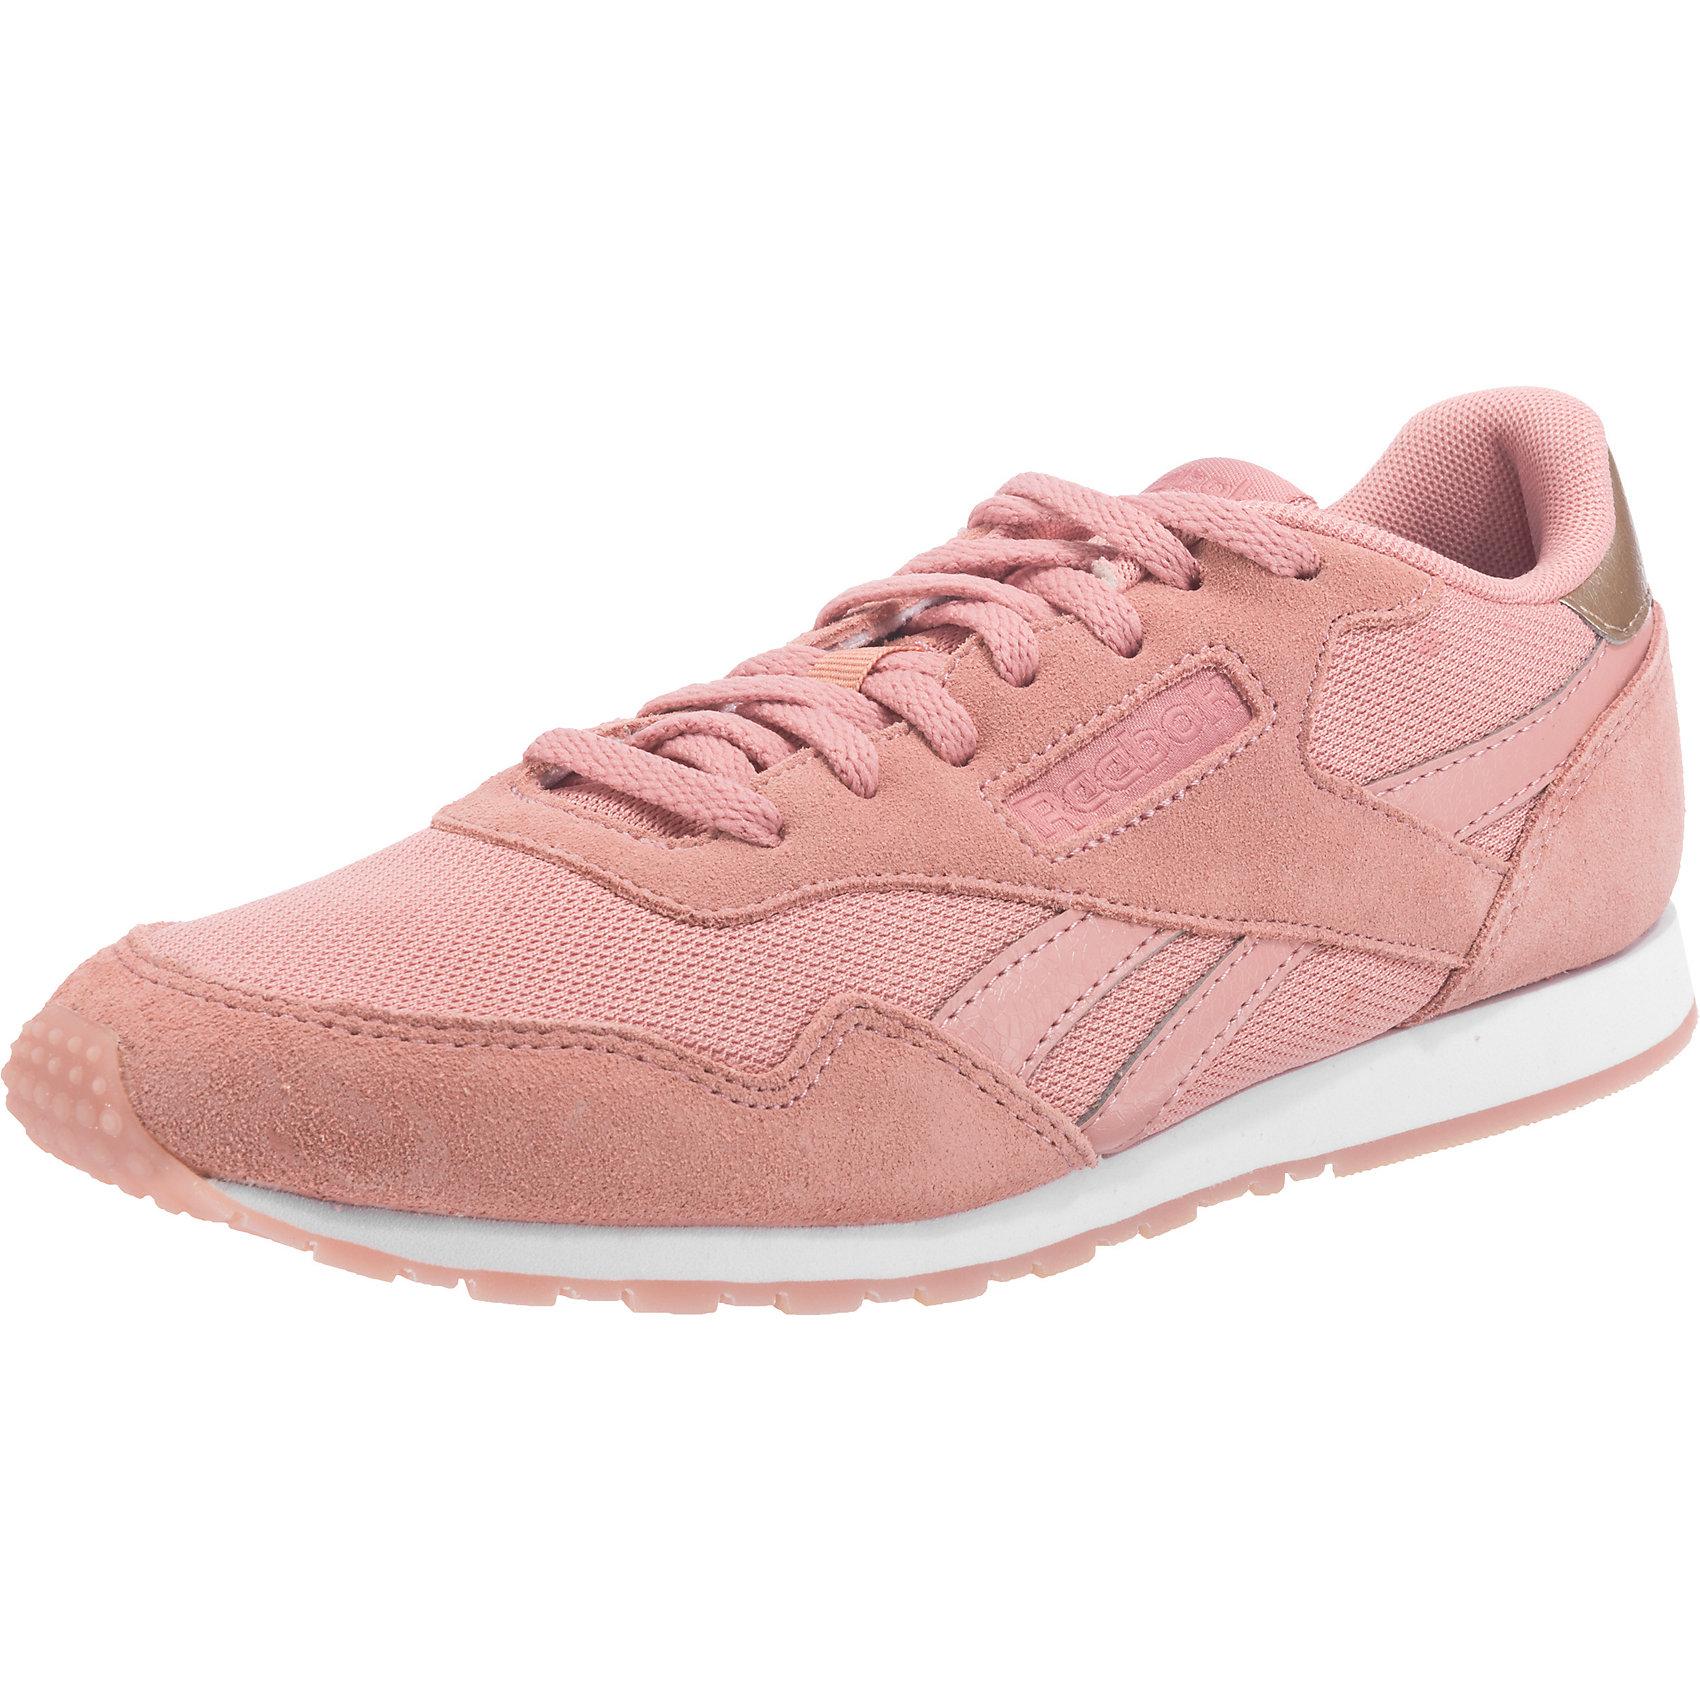 Neu REEBOK ROYAL ULTRA SL 7408242 Sneakers Niedrig 7408242 SL für Damen rosa     eabf0e